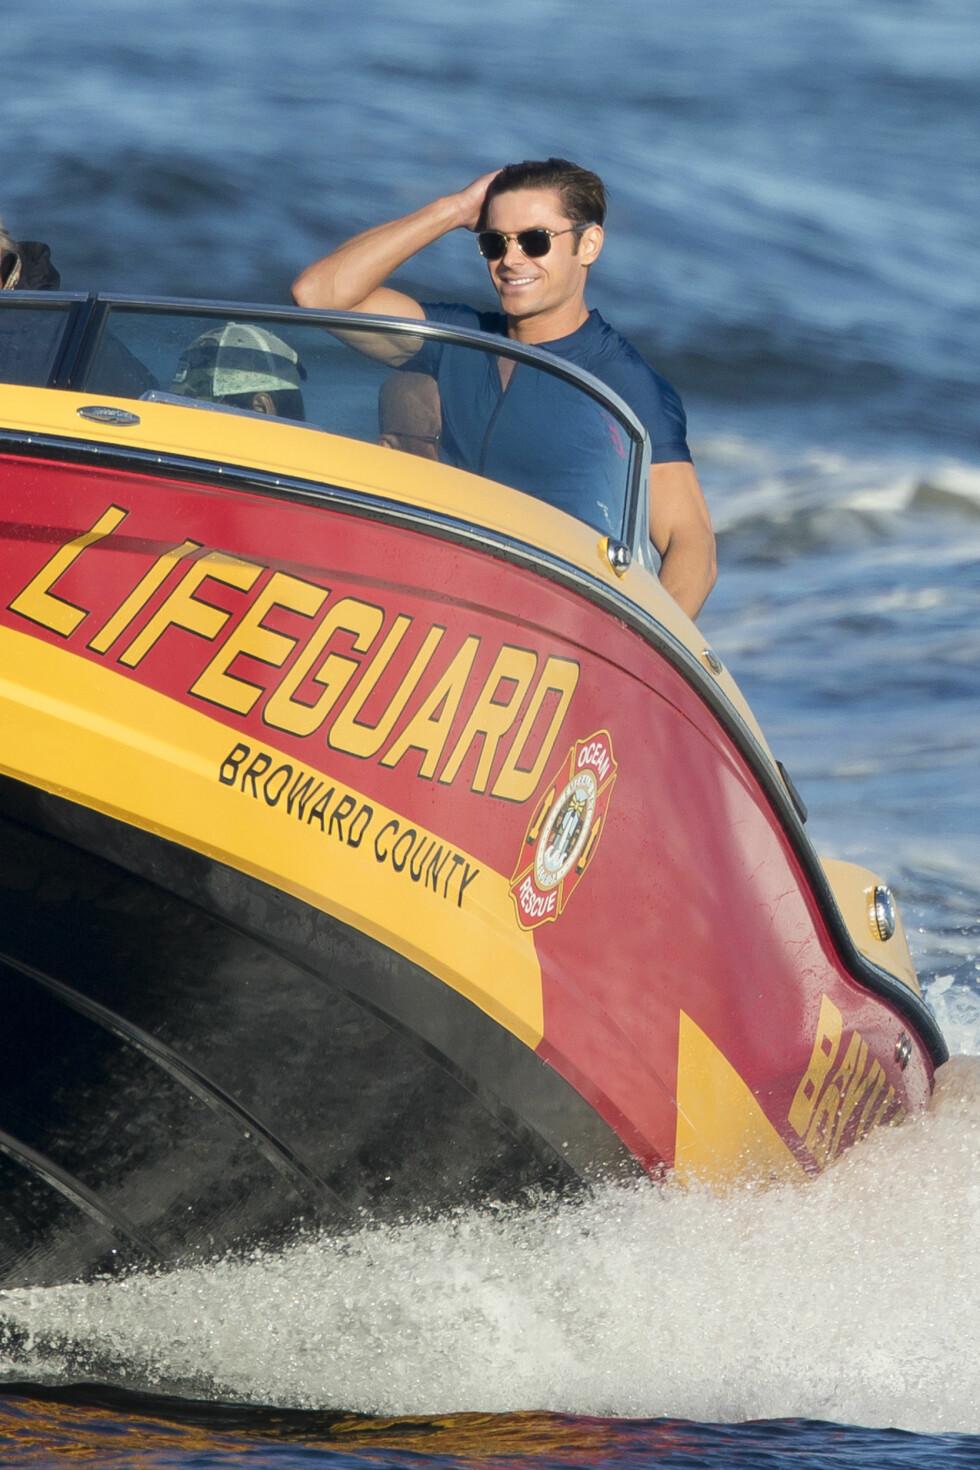 Zac Efron i en av de ikoniske Baywatch-båtene.  Foto: Splash News